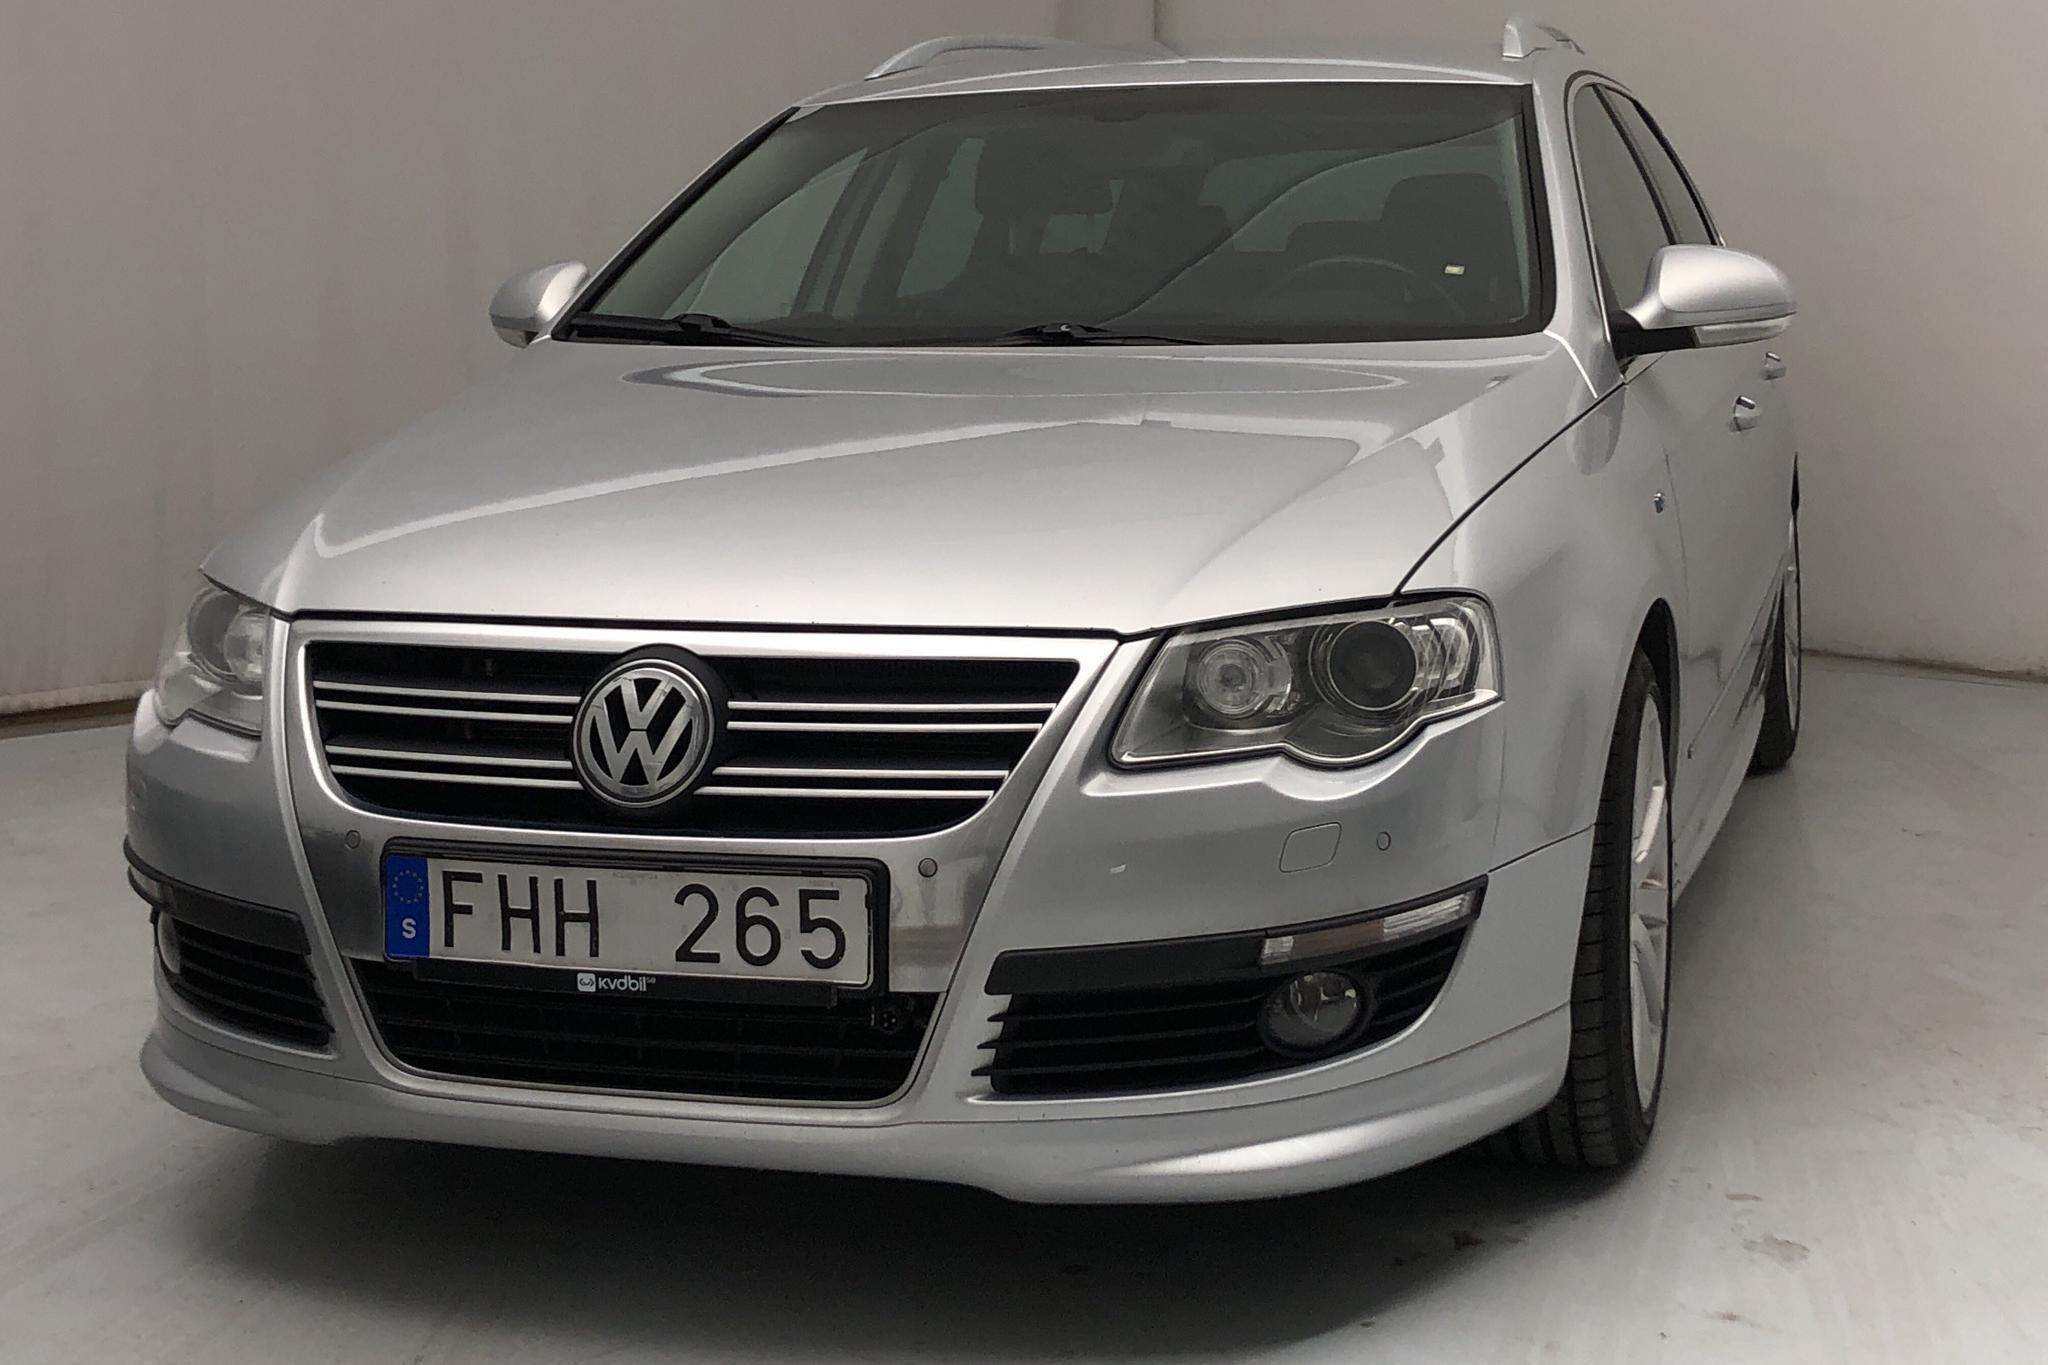 VW Passat 2.0 TDI 4-Motion Variant (170hk) - 13 784 mil - Automat - silver - 2010